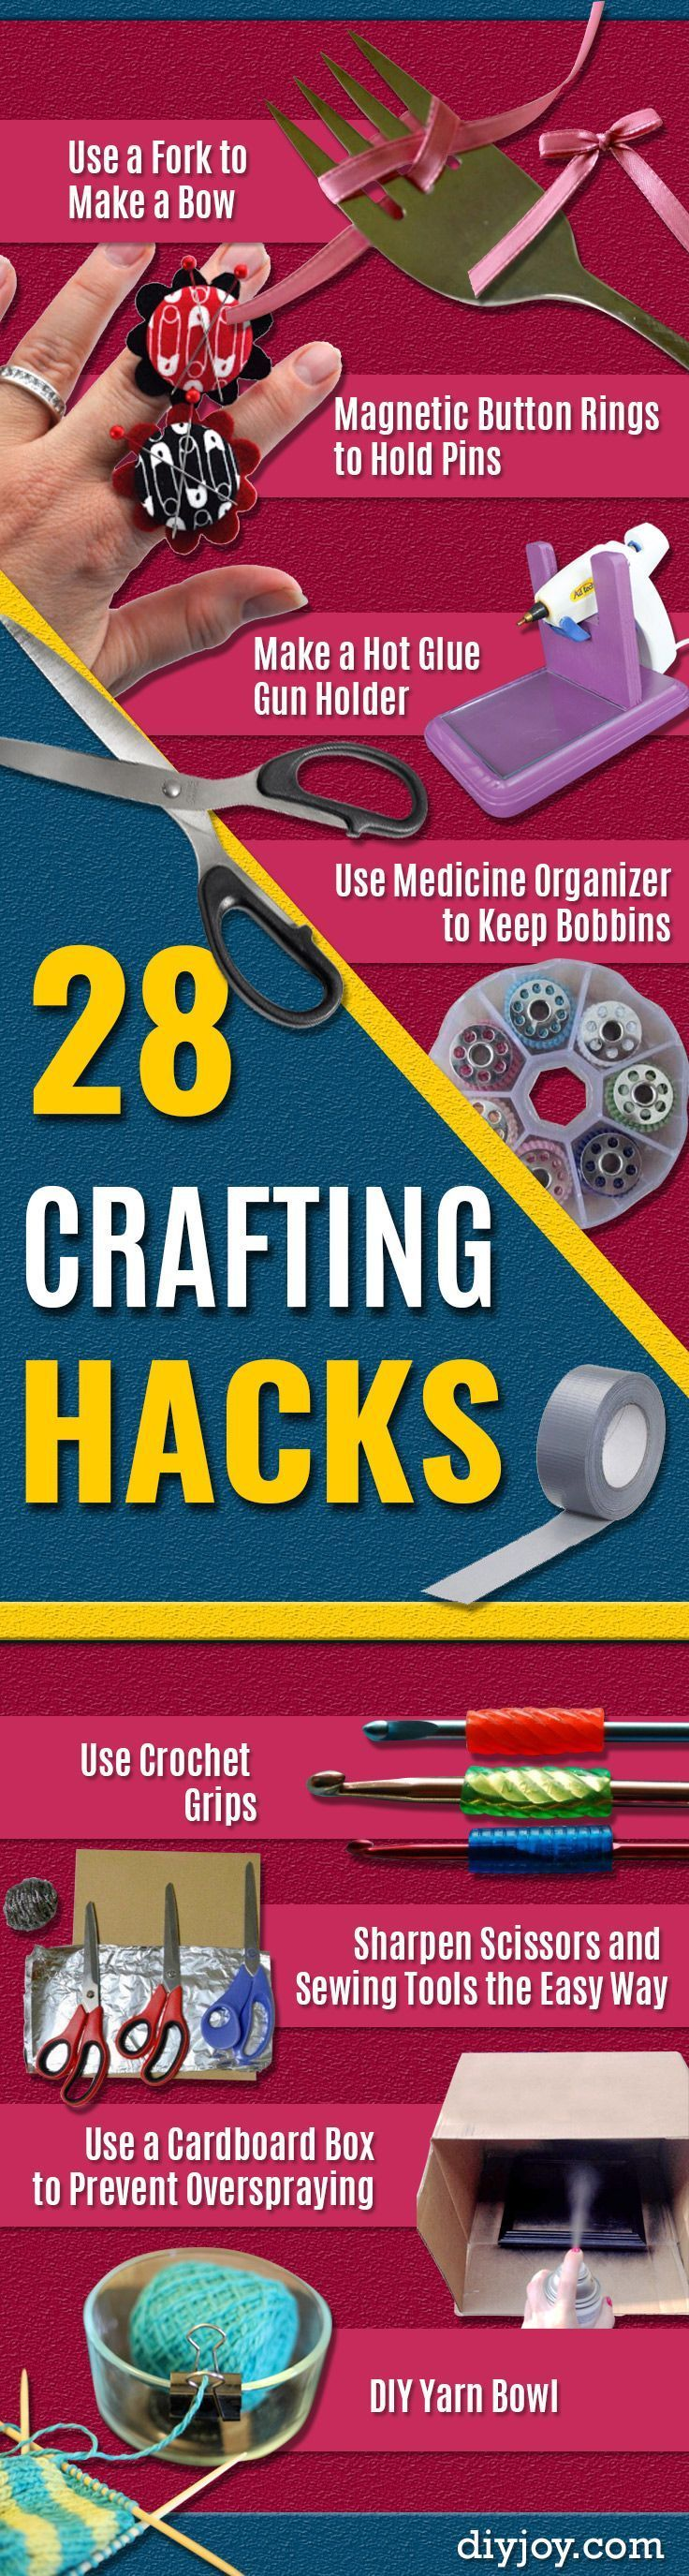 DIY Crafting Hacks - Easy Crafting Ideas for Quick DIY Projects - Awesome Creative, Crafty Ways for Dollar Store, Organizing, Yarn, Scissors and Pom Poms http://diyjoy.com/diy-crafting-hacks